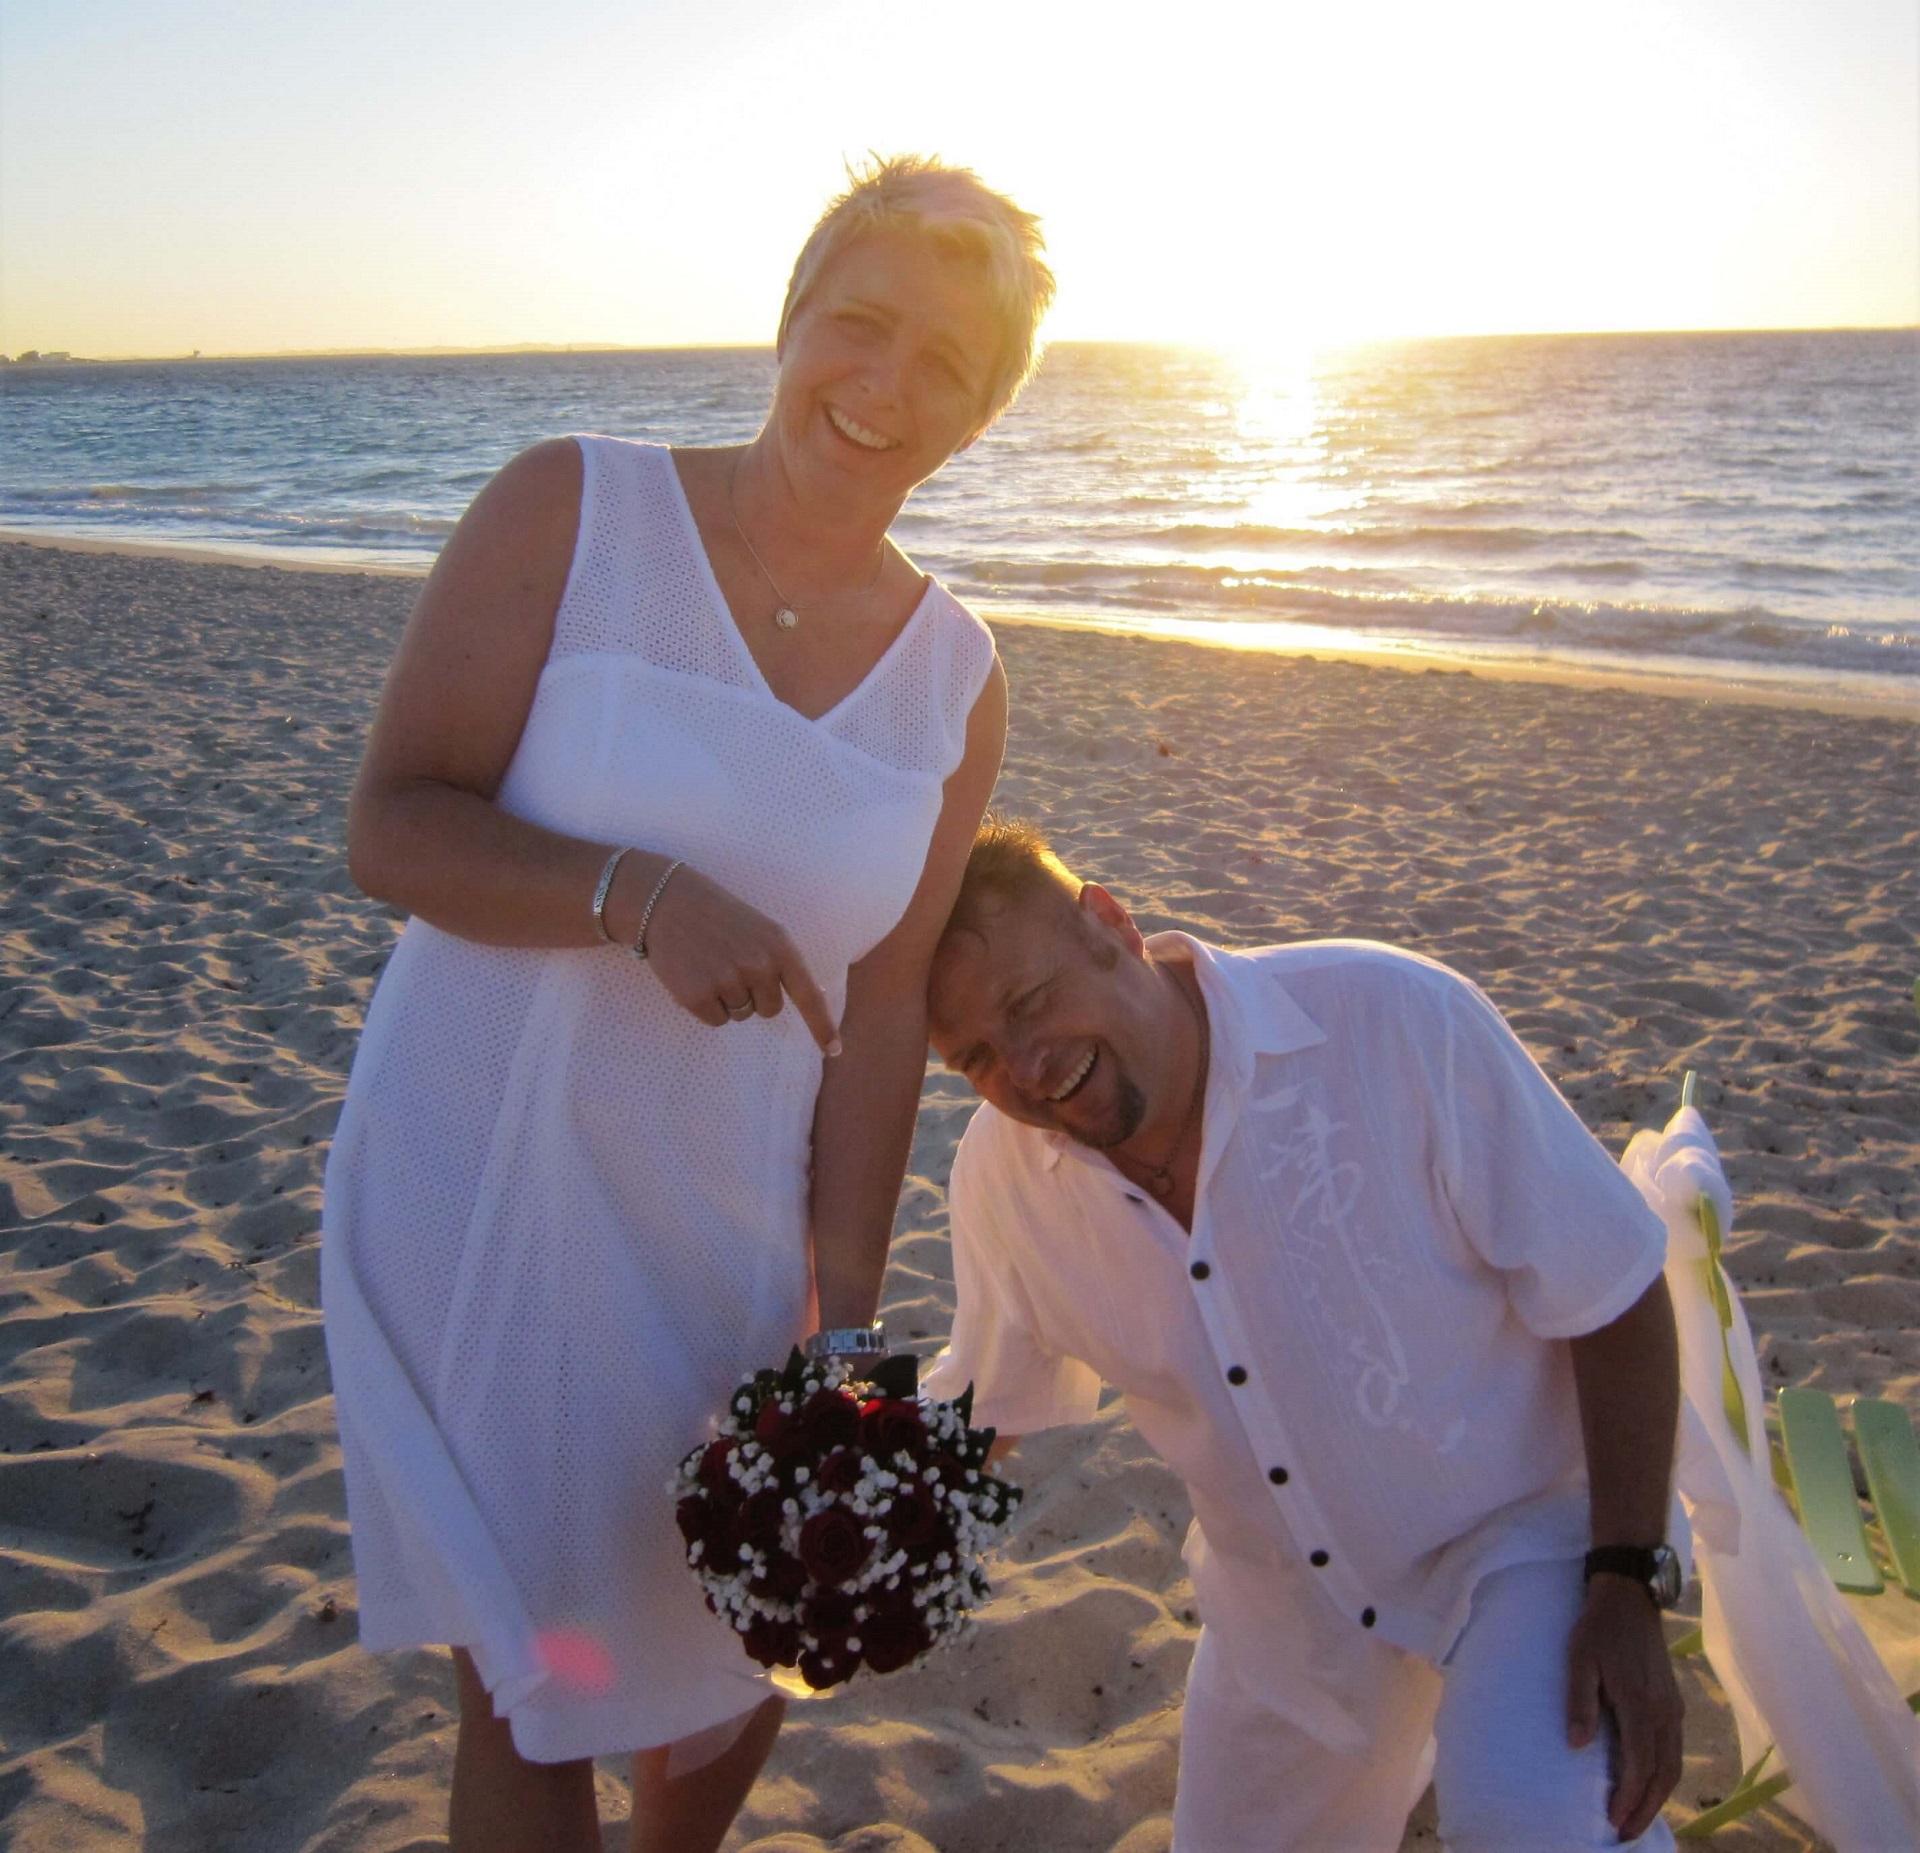 https://www.lovebirdceremonies.com.au/wp-content/uploads/2020/07/Bruno-Katja-3.jpg